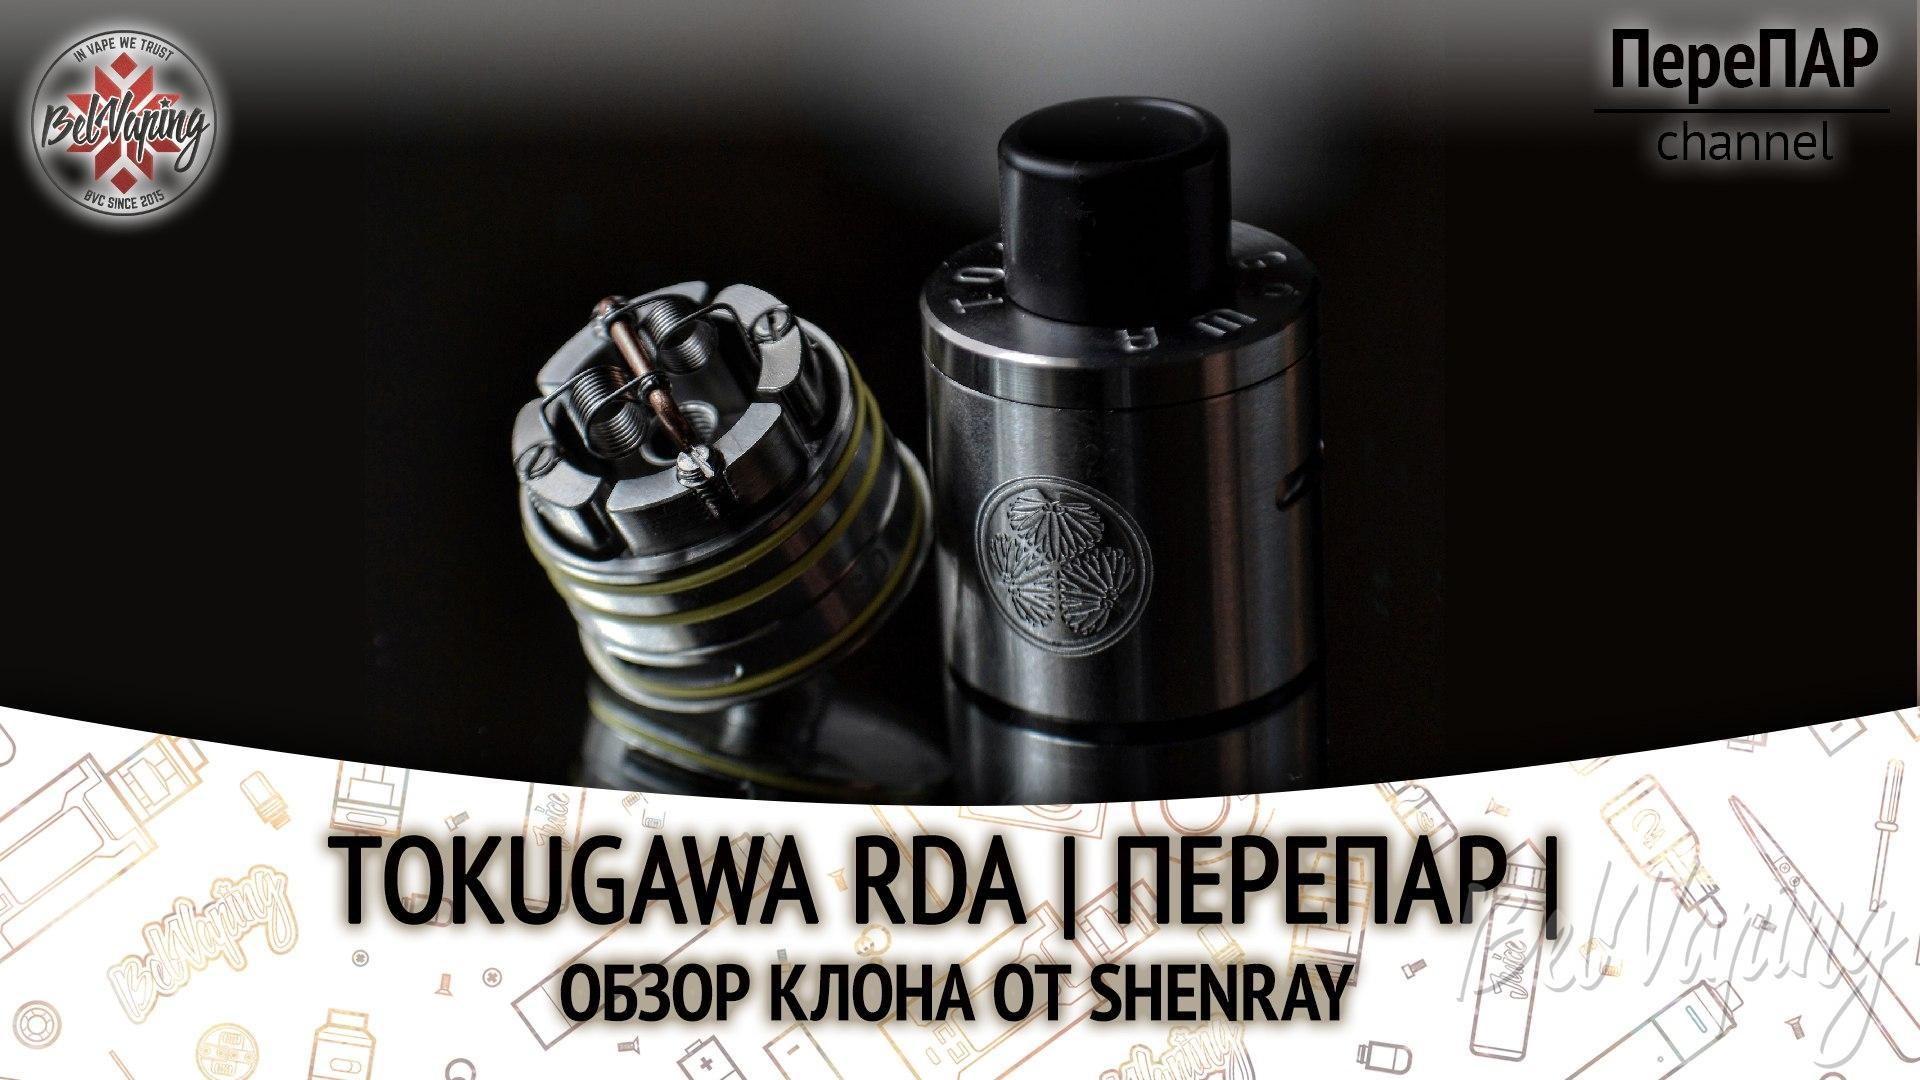 Обзор клона дрипки Tokugawa RDA